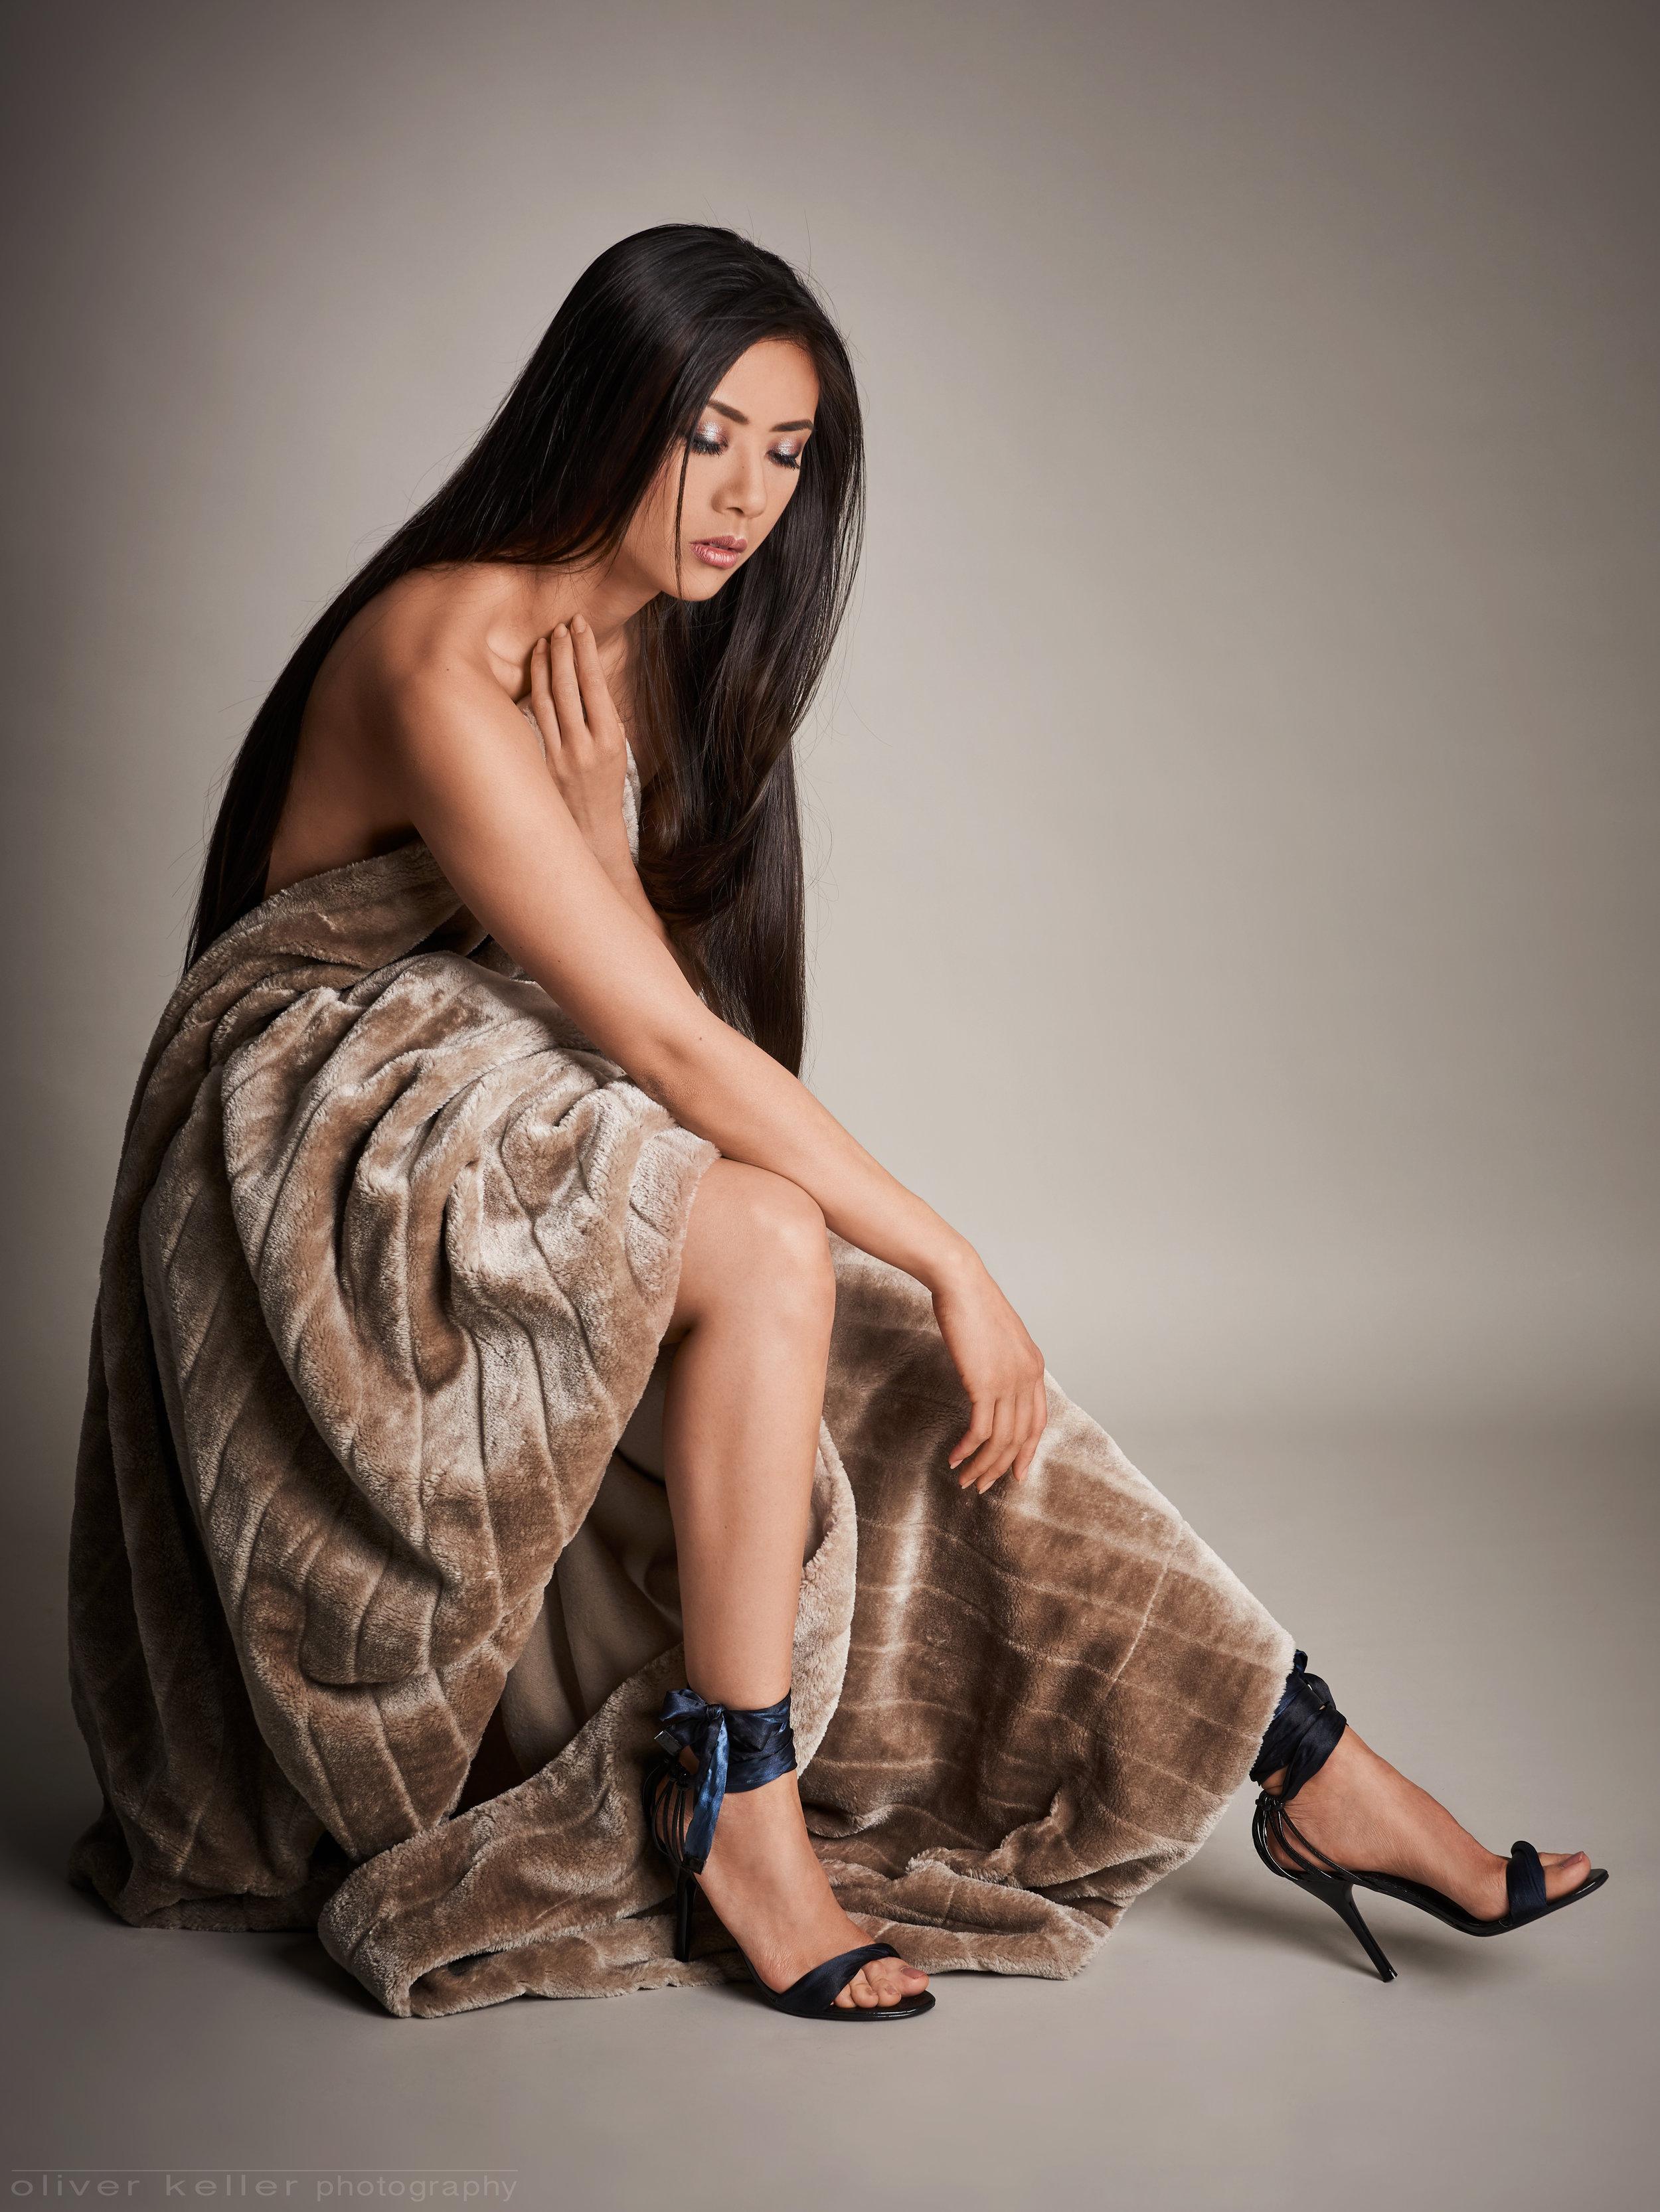 2018-04-30-beauty-Minh15525.jpg